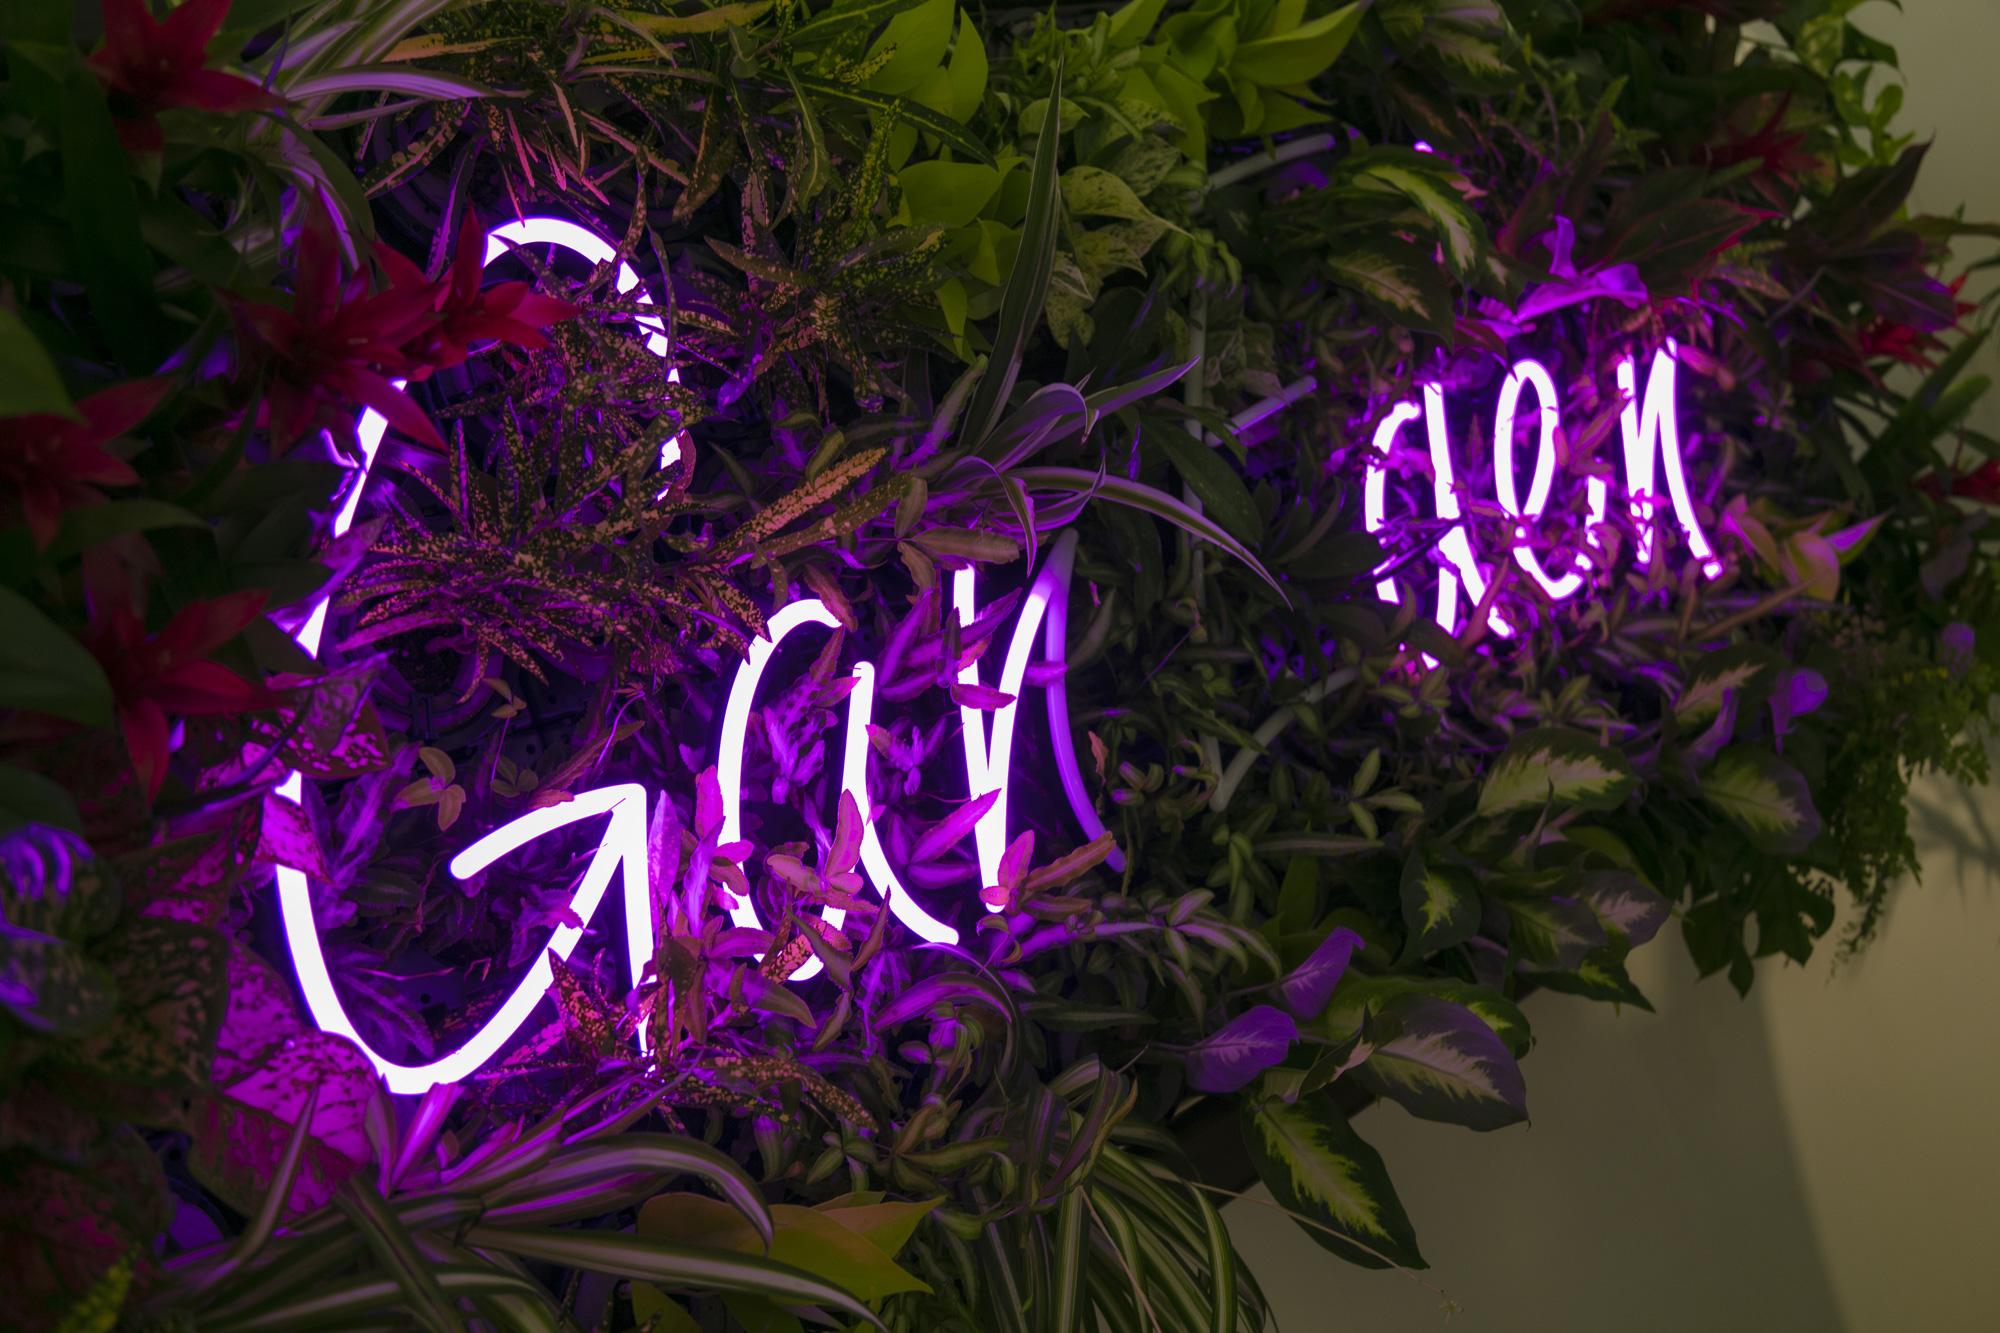 LEDネオンを植物の中にインテリアとして設置した例